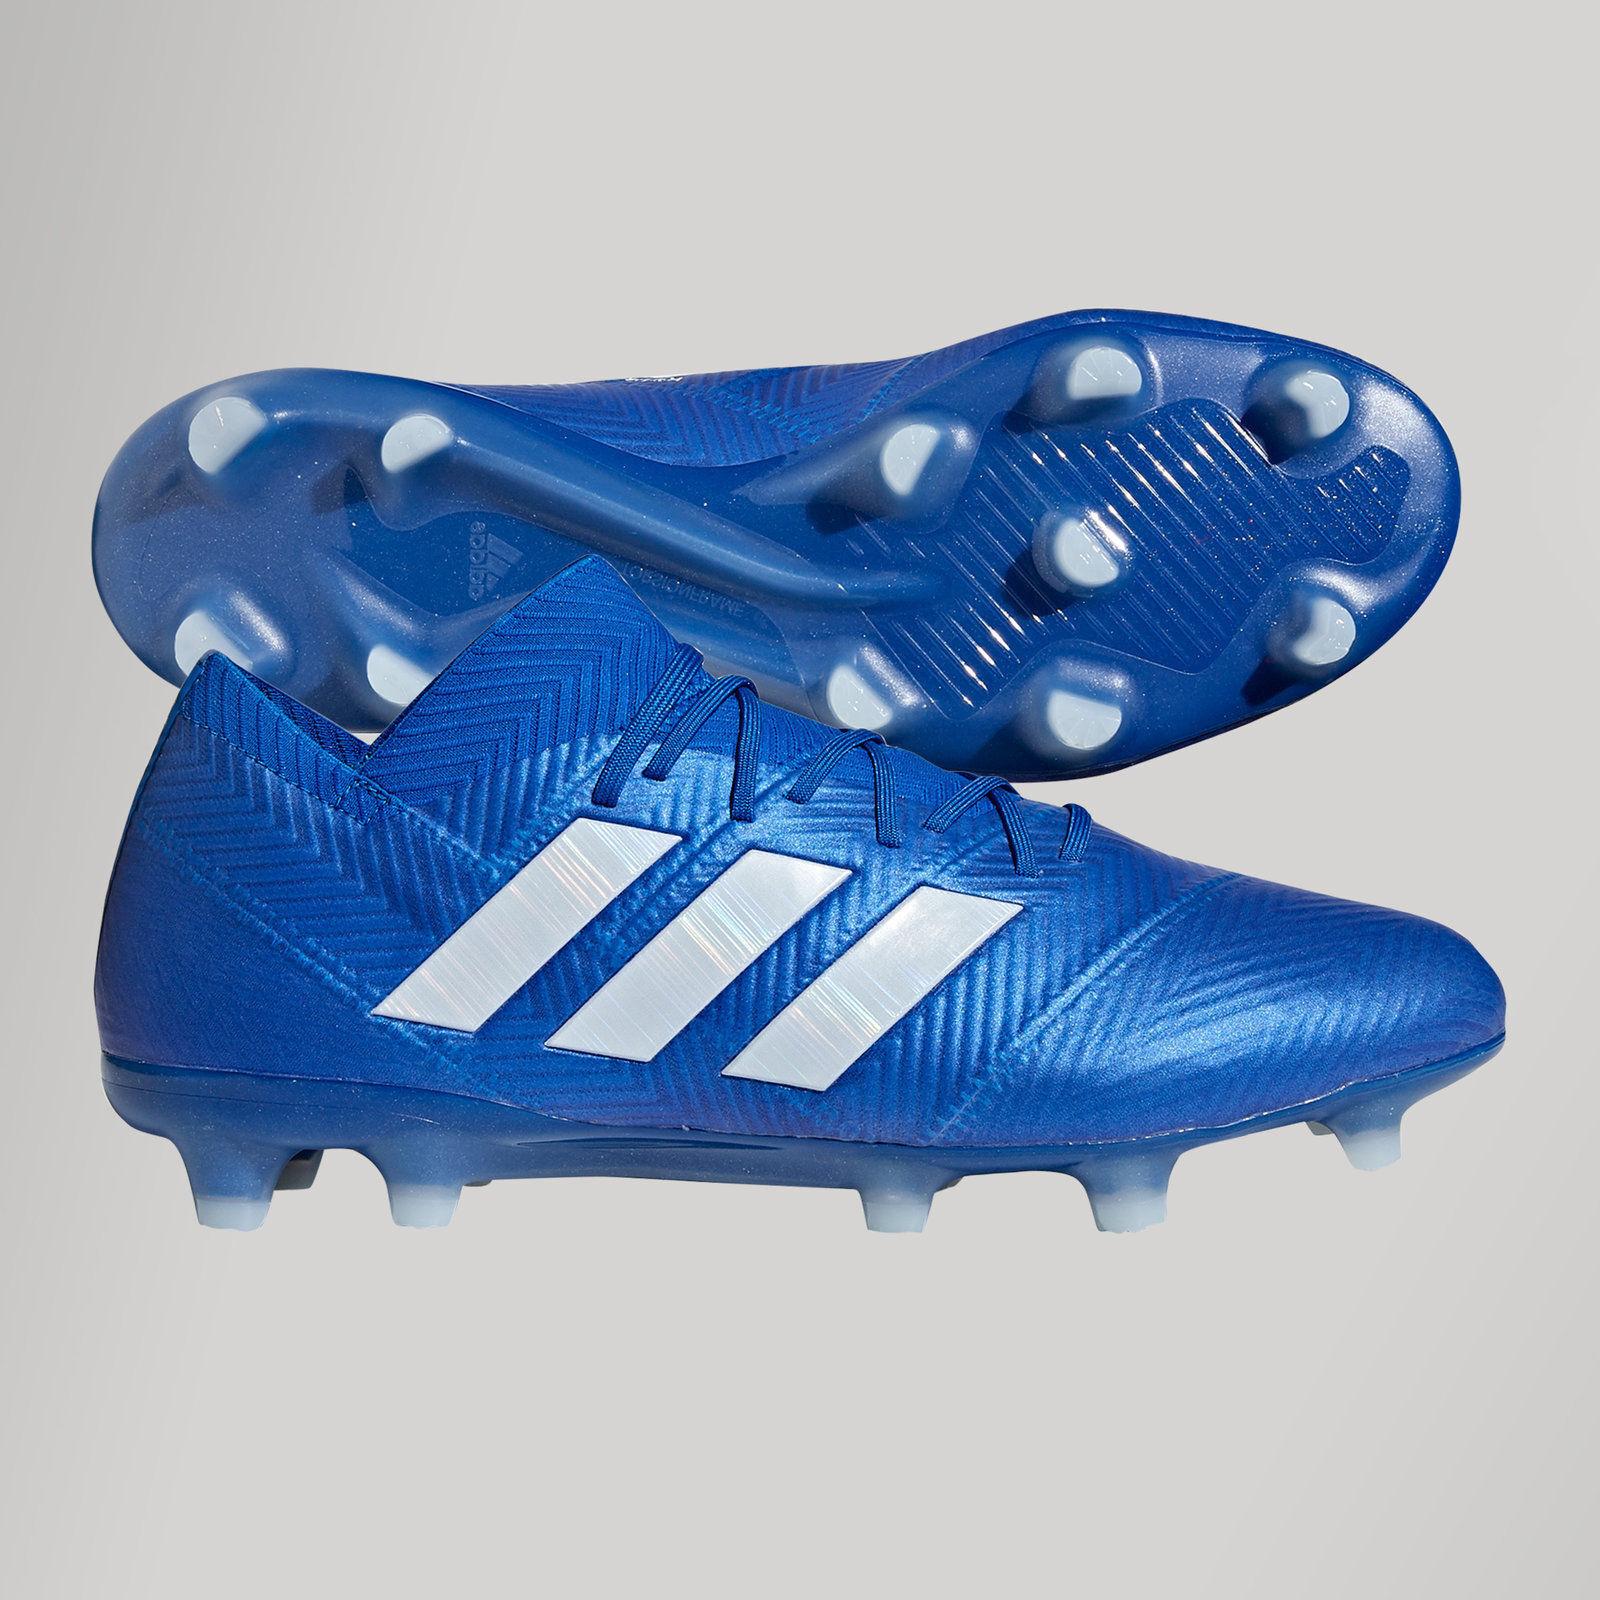 Adidas botas de fútbol nemeziz 18.1 FG BALONPÍE 8.5UK Tachuelas Zapatillas Messi Sports